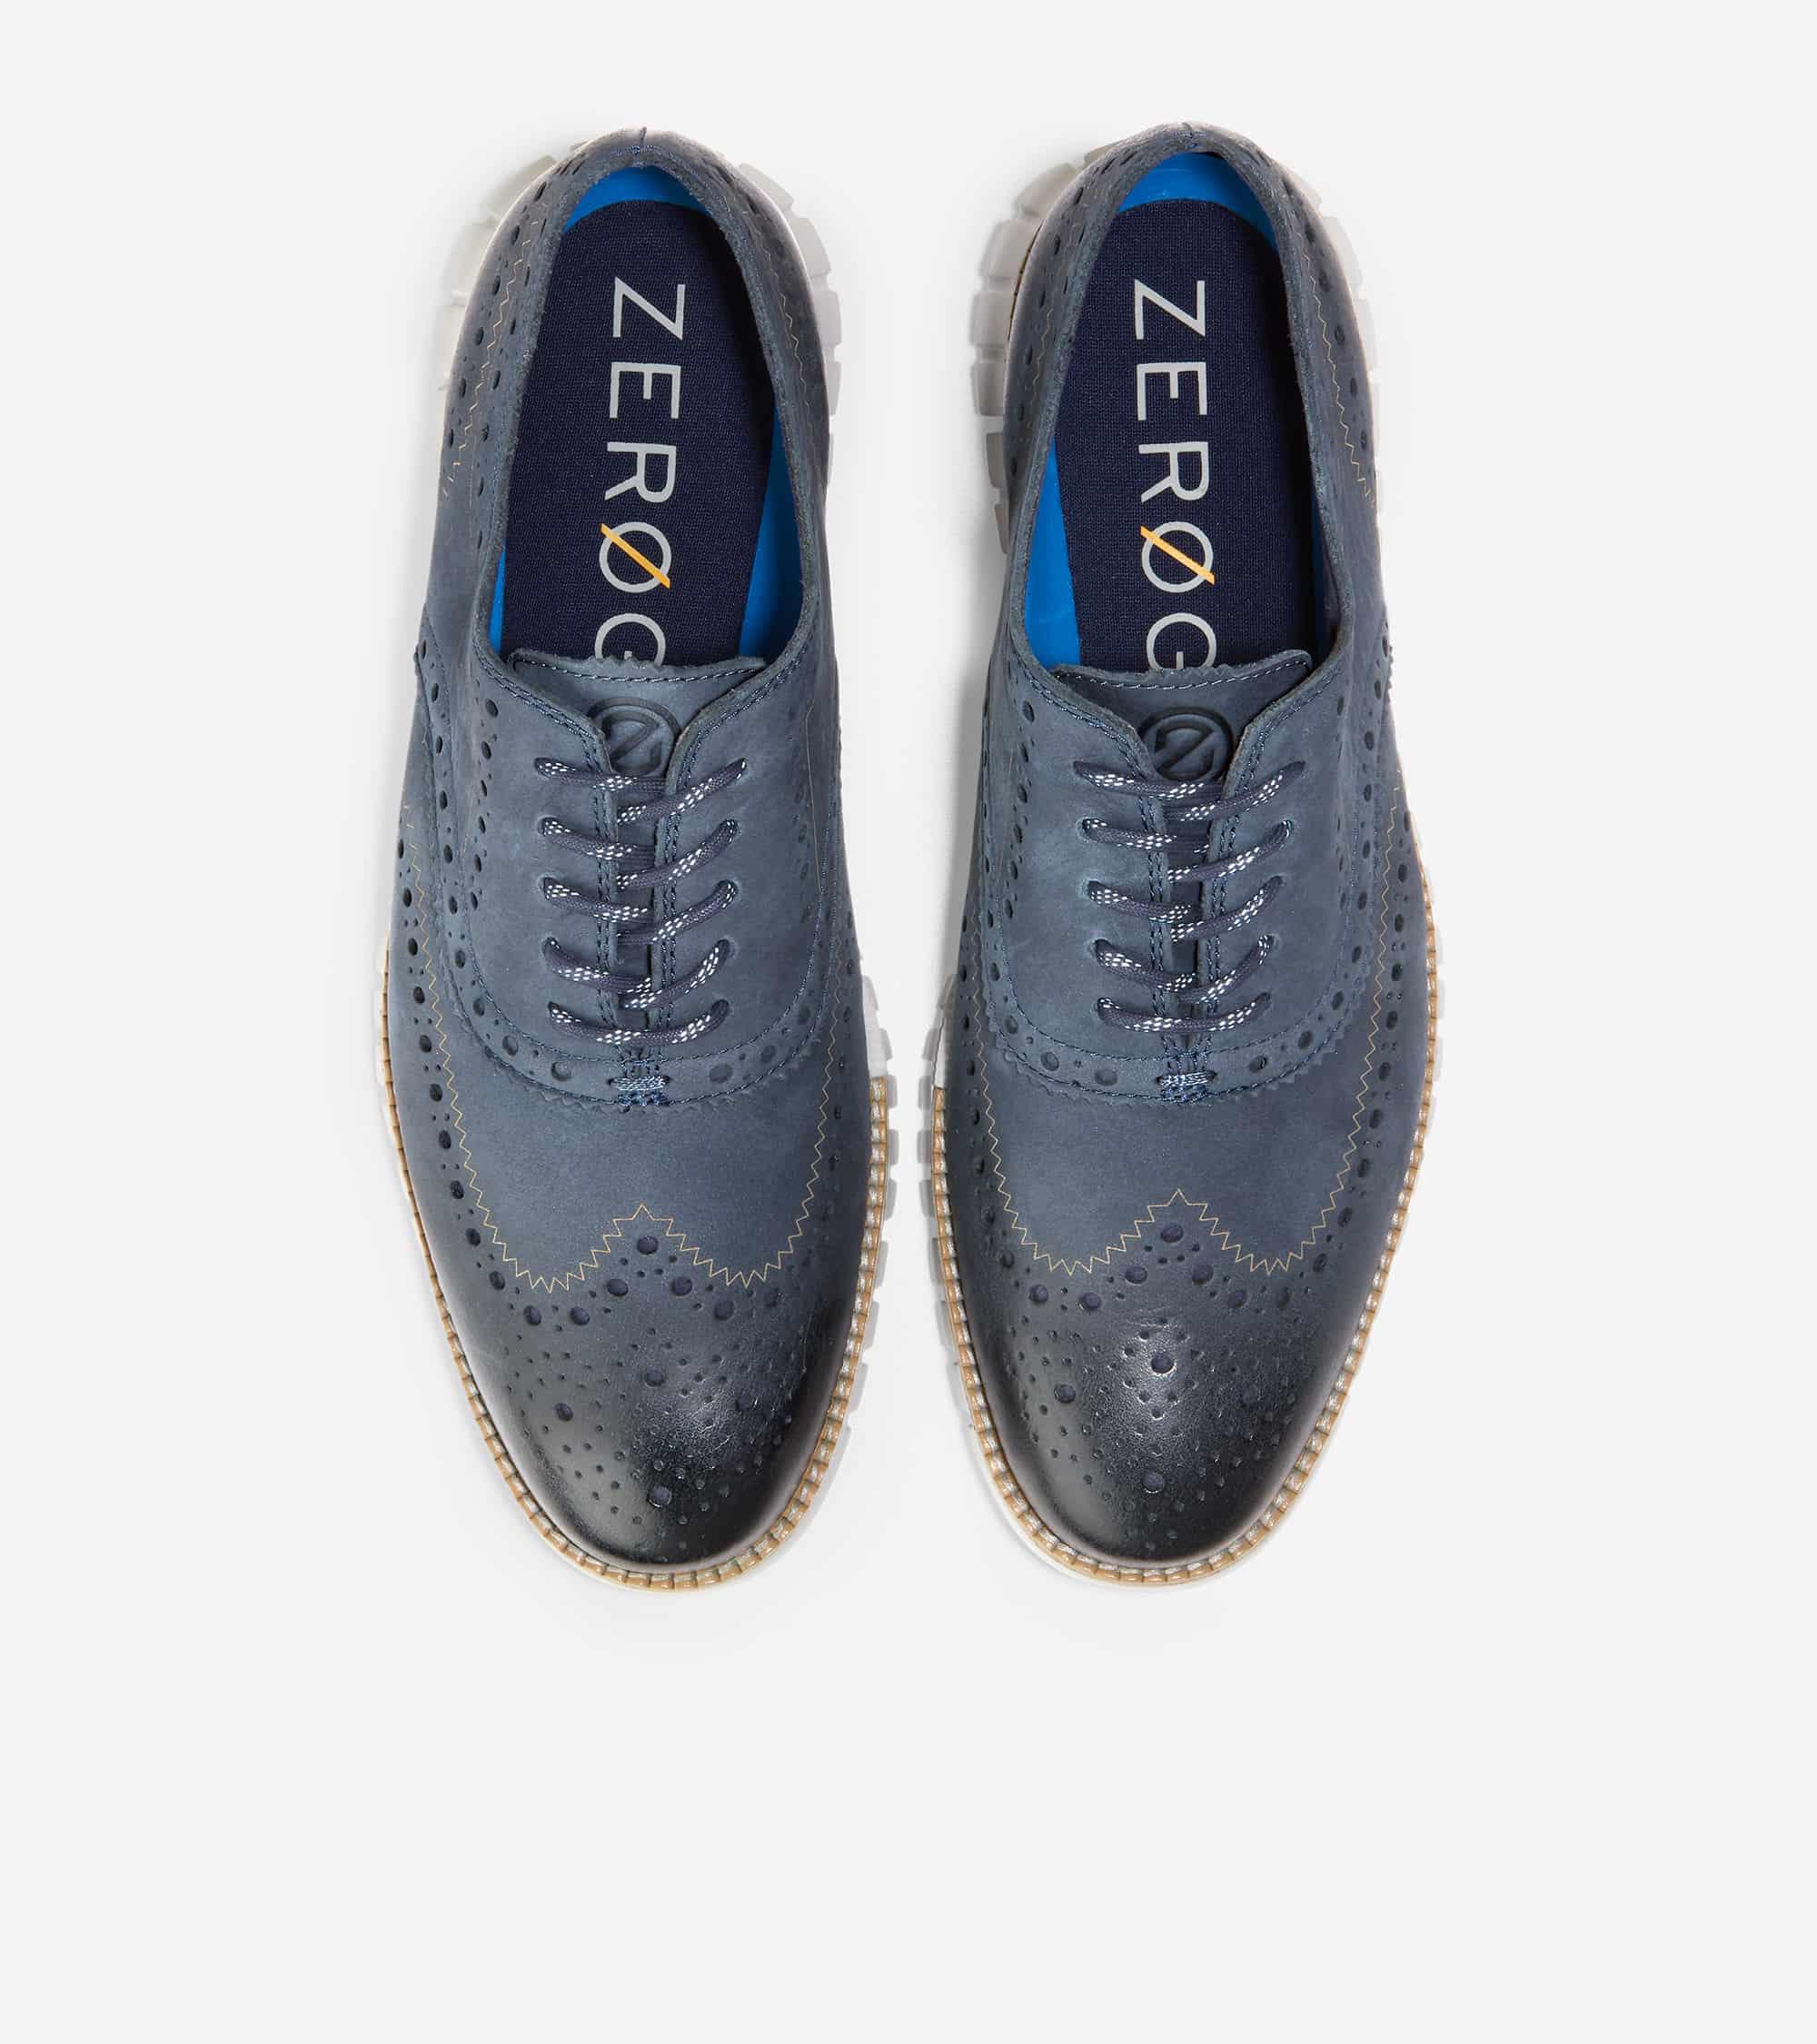 ZEROGRAND WINGTIP OXFORD OMBRE BLUE NUBUCK/COOL GRAY